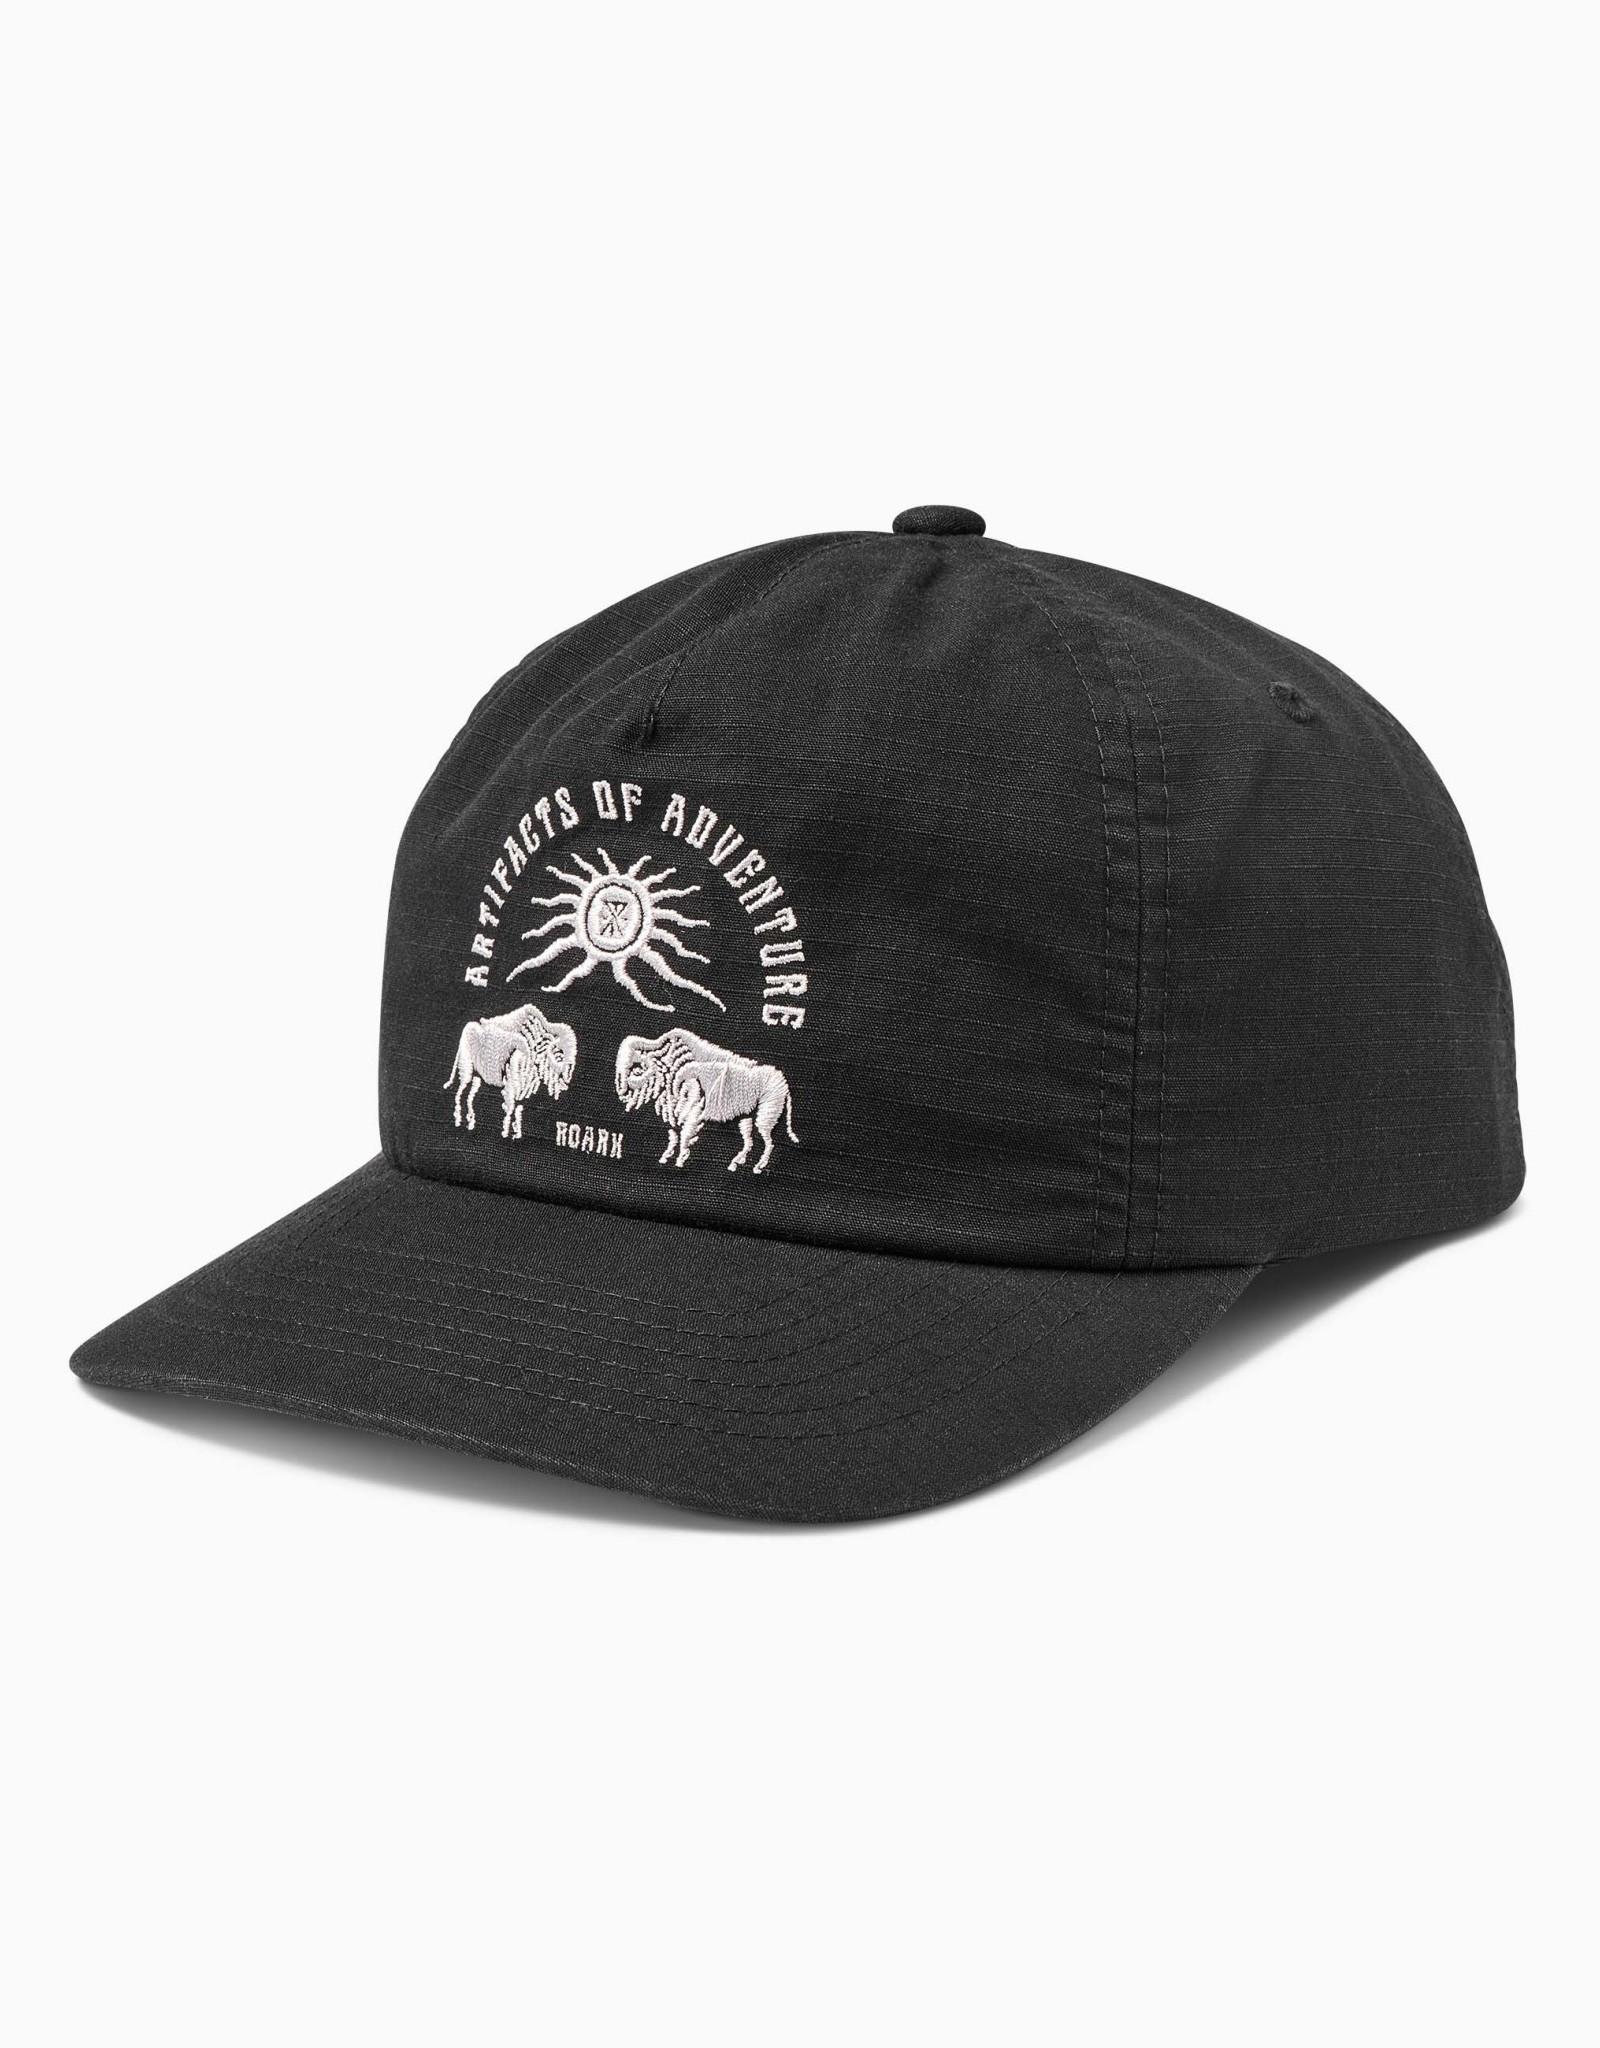 Roark Revival Roark Artifacts Hat BLK